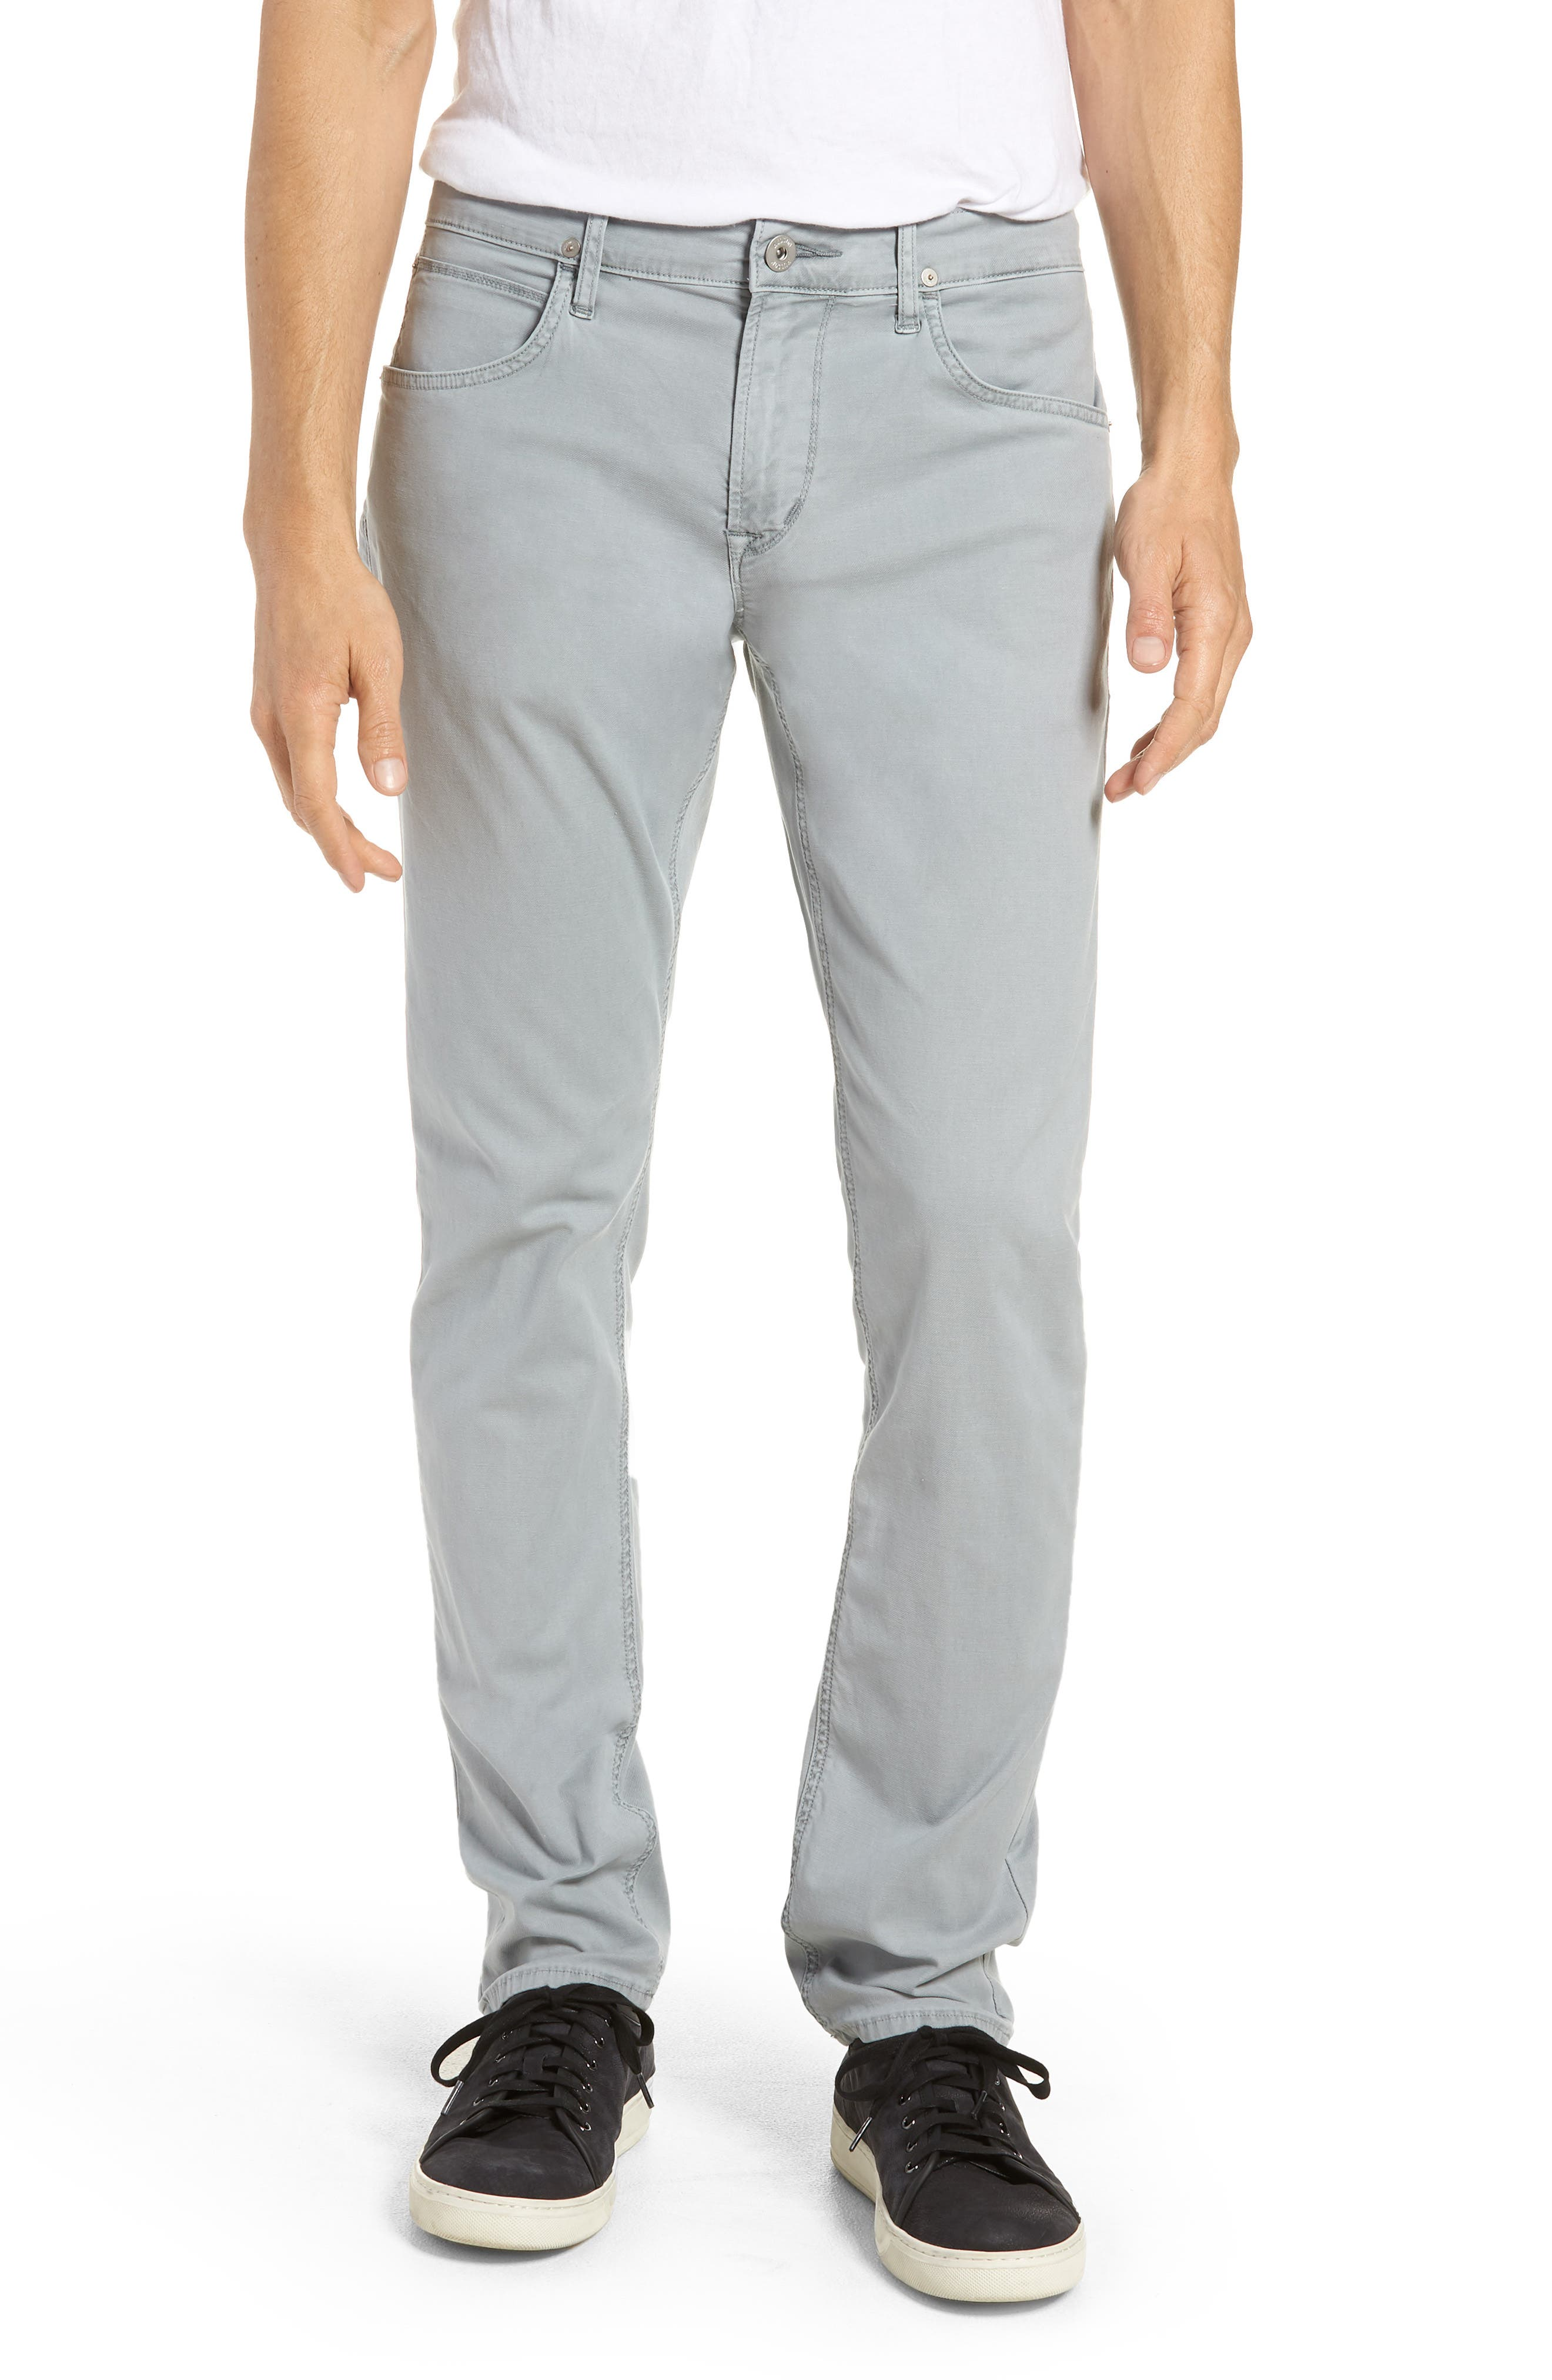 HUDSON JEANS Blake Slim Fit Jeans, Main, color, 400